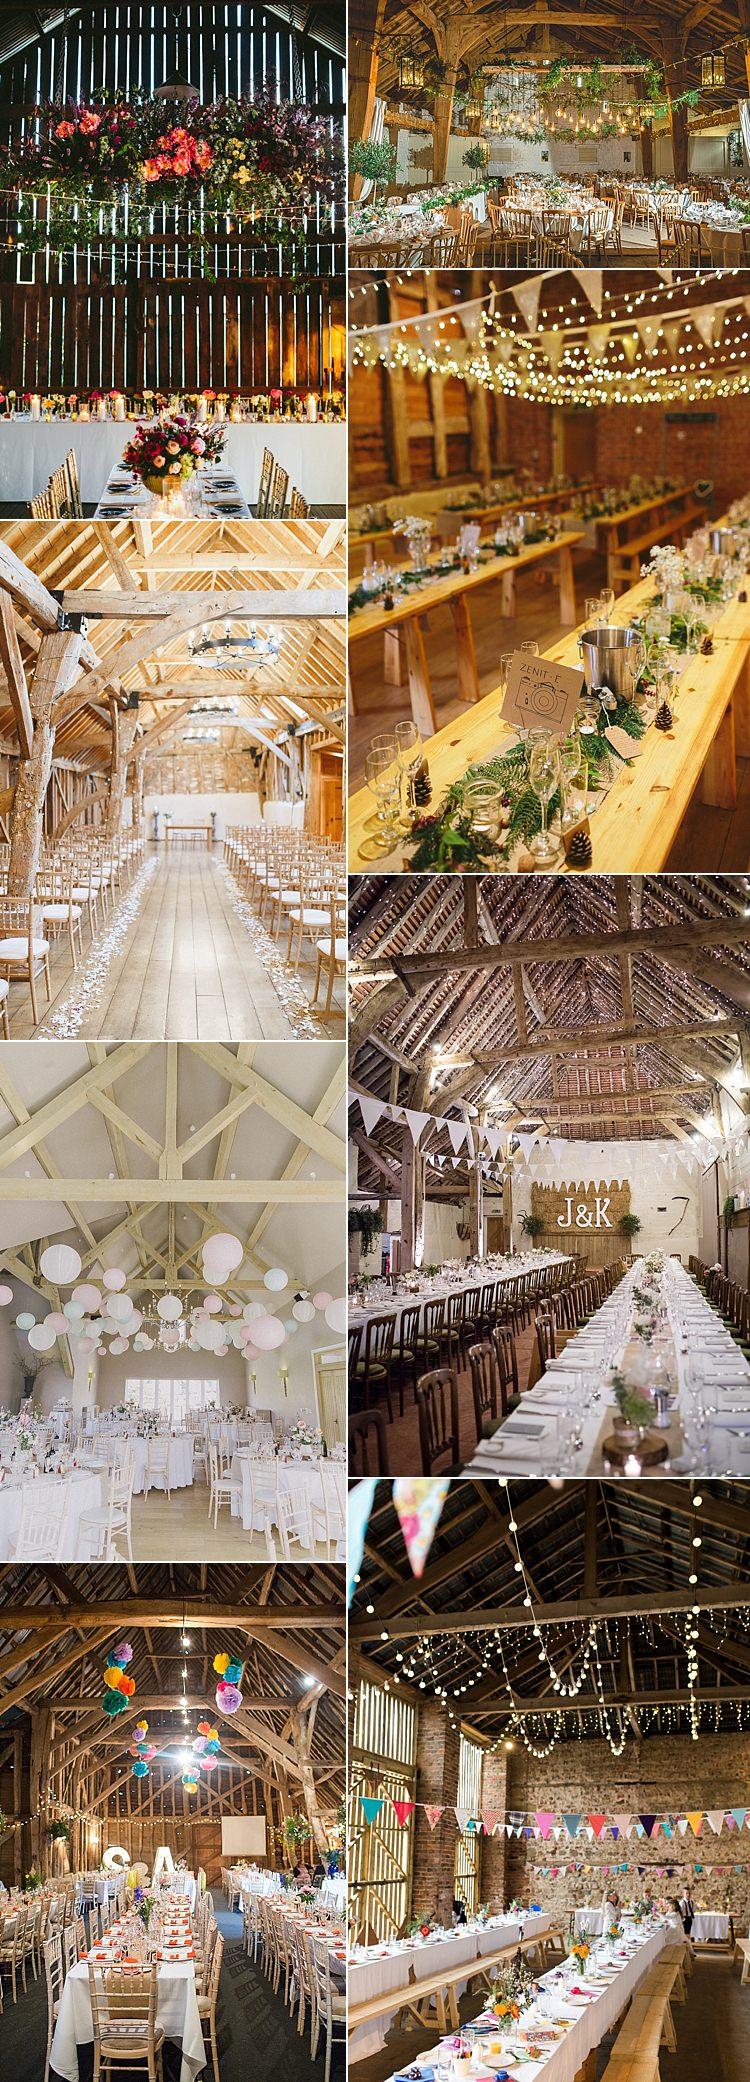 Barn Weddings Ideas Inspiration UK Decoration